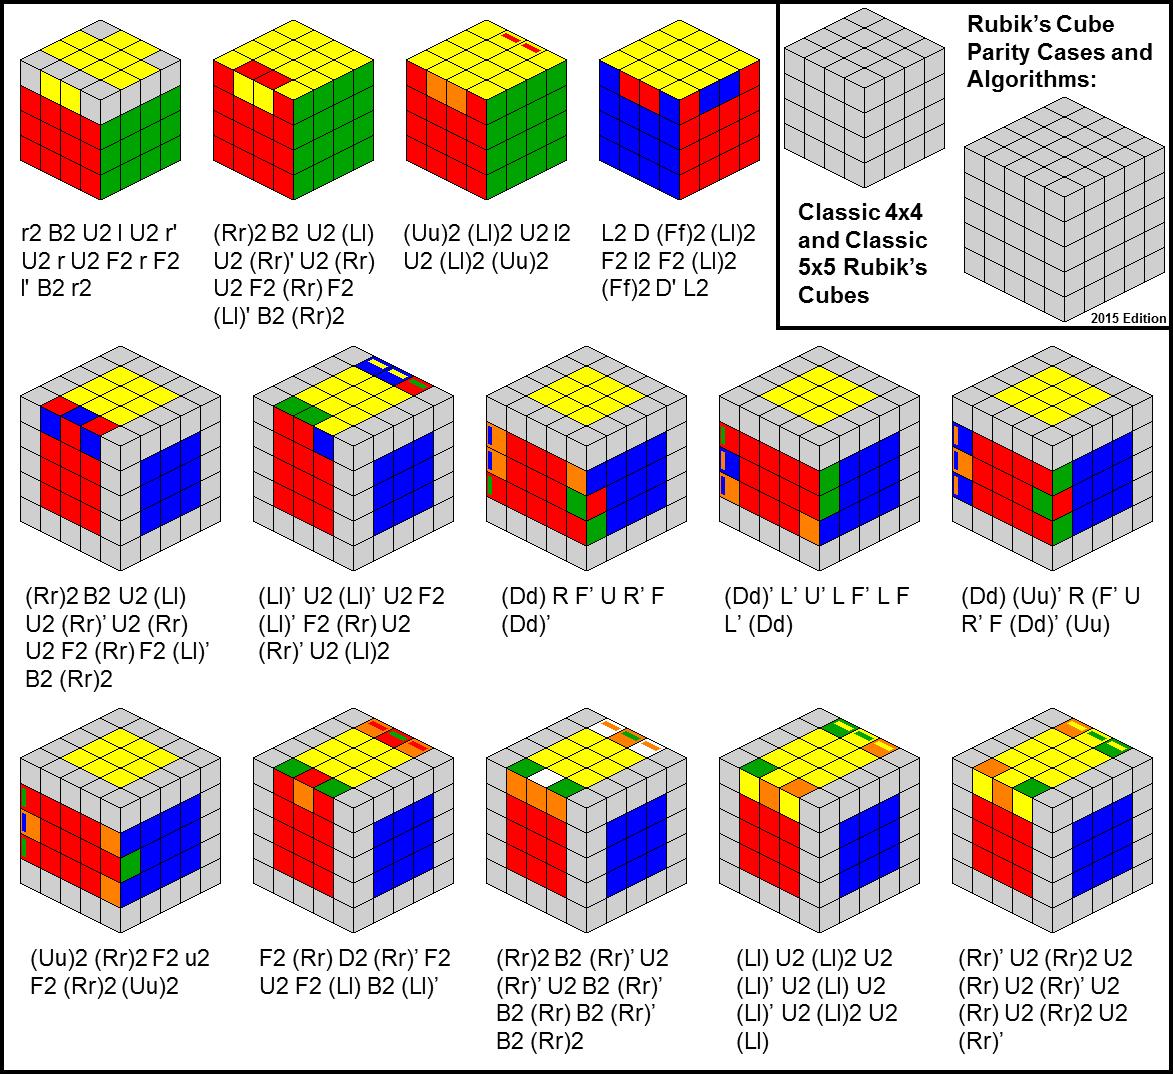 rubik 39 s cube parity cases and algorithms classic 4x4 and classic 5x5 rubik 39 s cubes rubiks. Black Bedroom Furniture Sets. Home Design Ideas